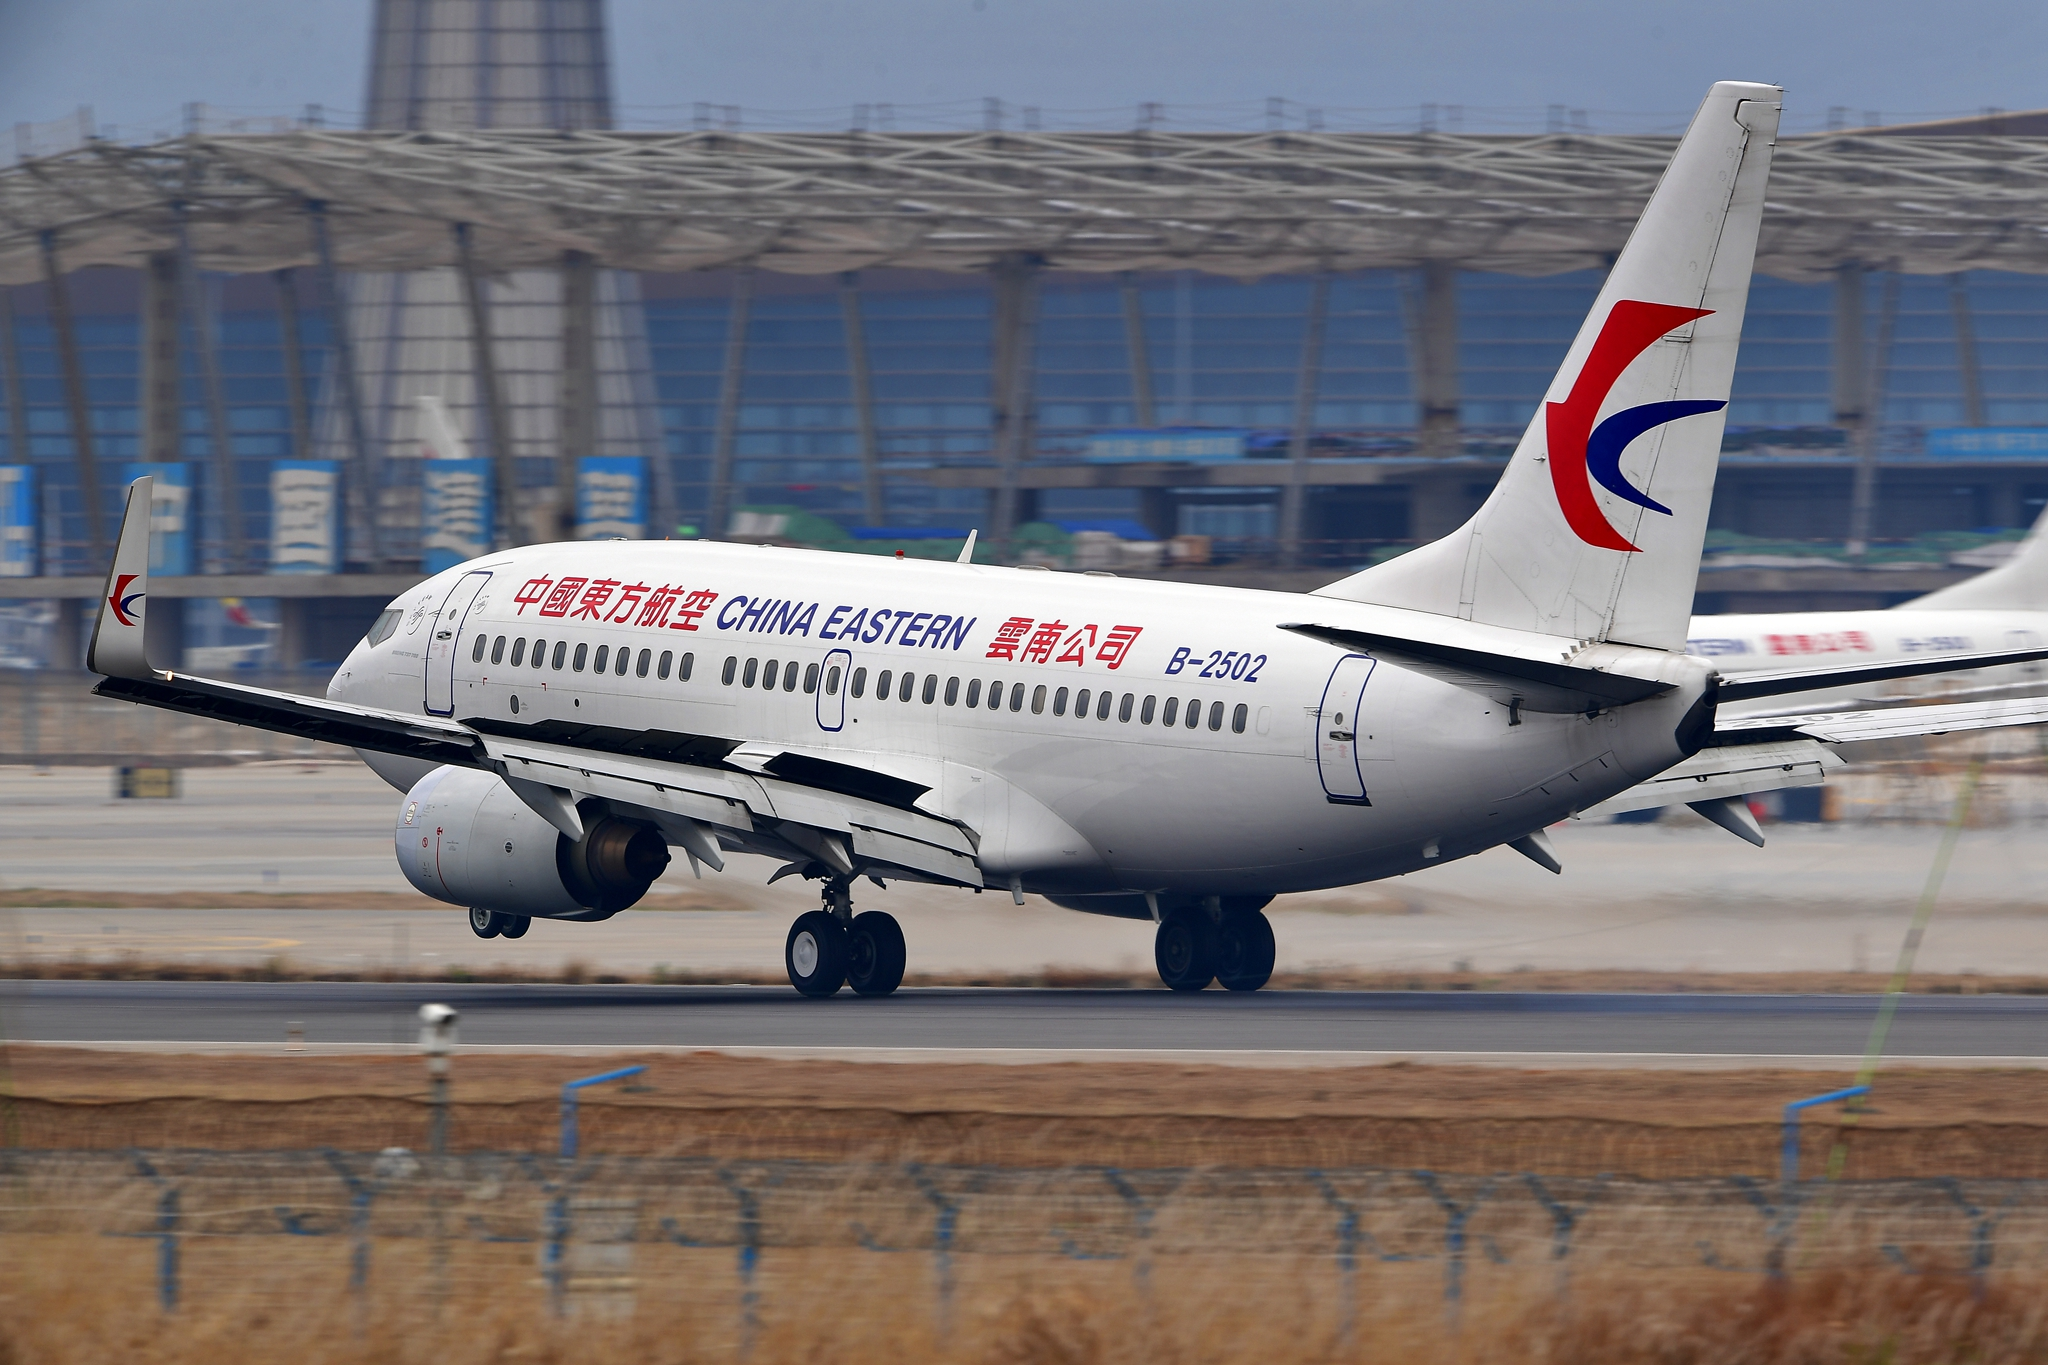 Re:[原创]KMG 庚子年初四再赴长水之约 都是似曾相识 都是熟悉的味道 BOEING 737-700 B-2502 中国昆明长水国际机场